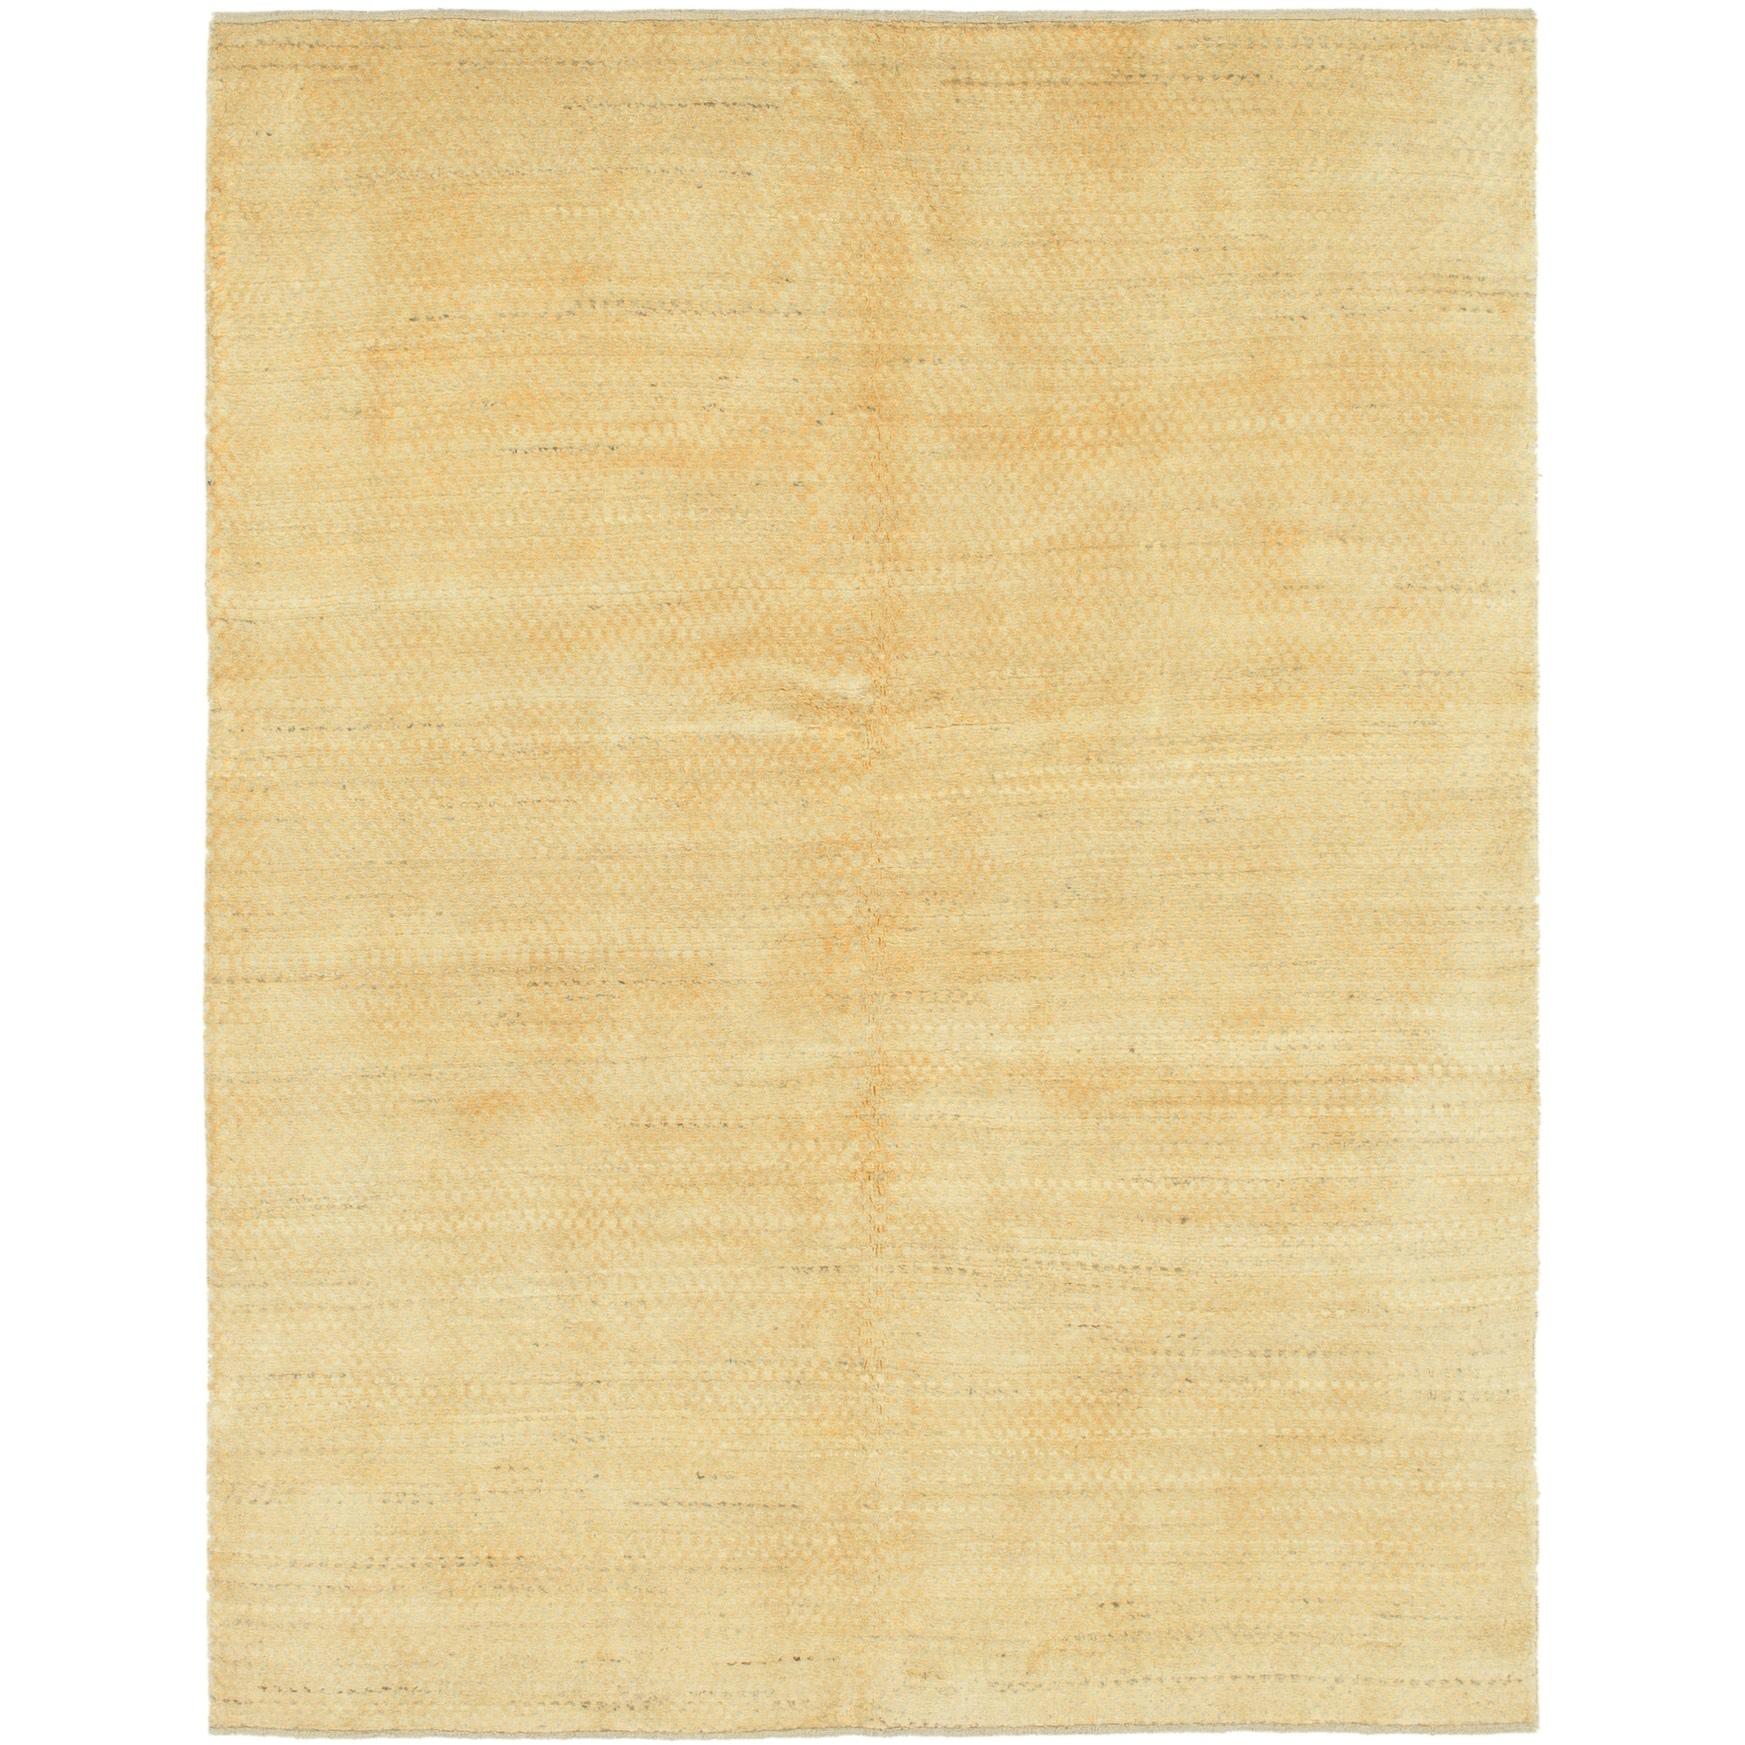 Hand Knotted Kashkuli Gabbeh Wool Area Rug - 5 x 6 6 (Gold - 5 x 6 6)